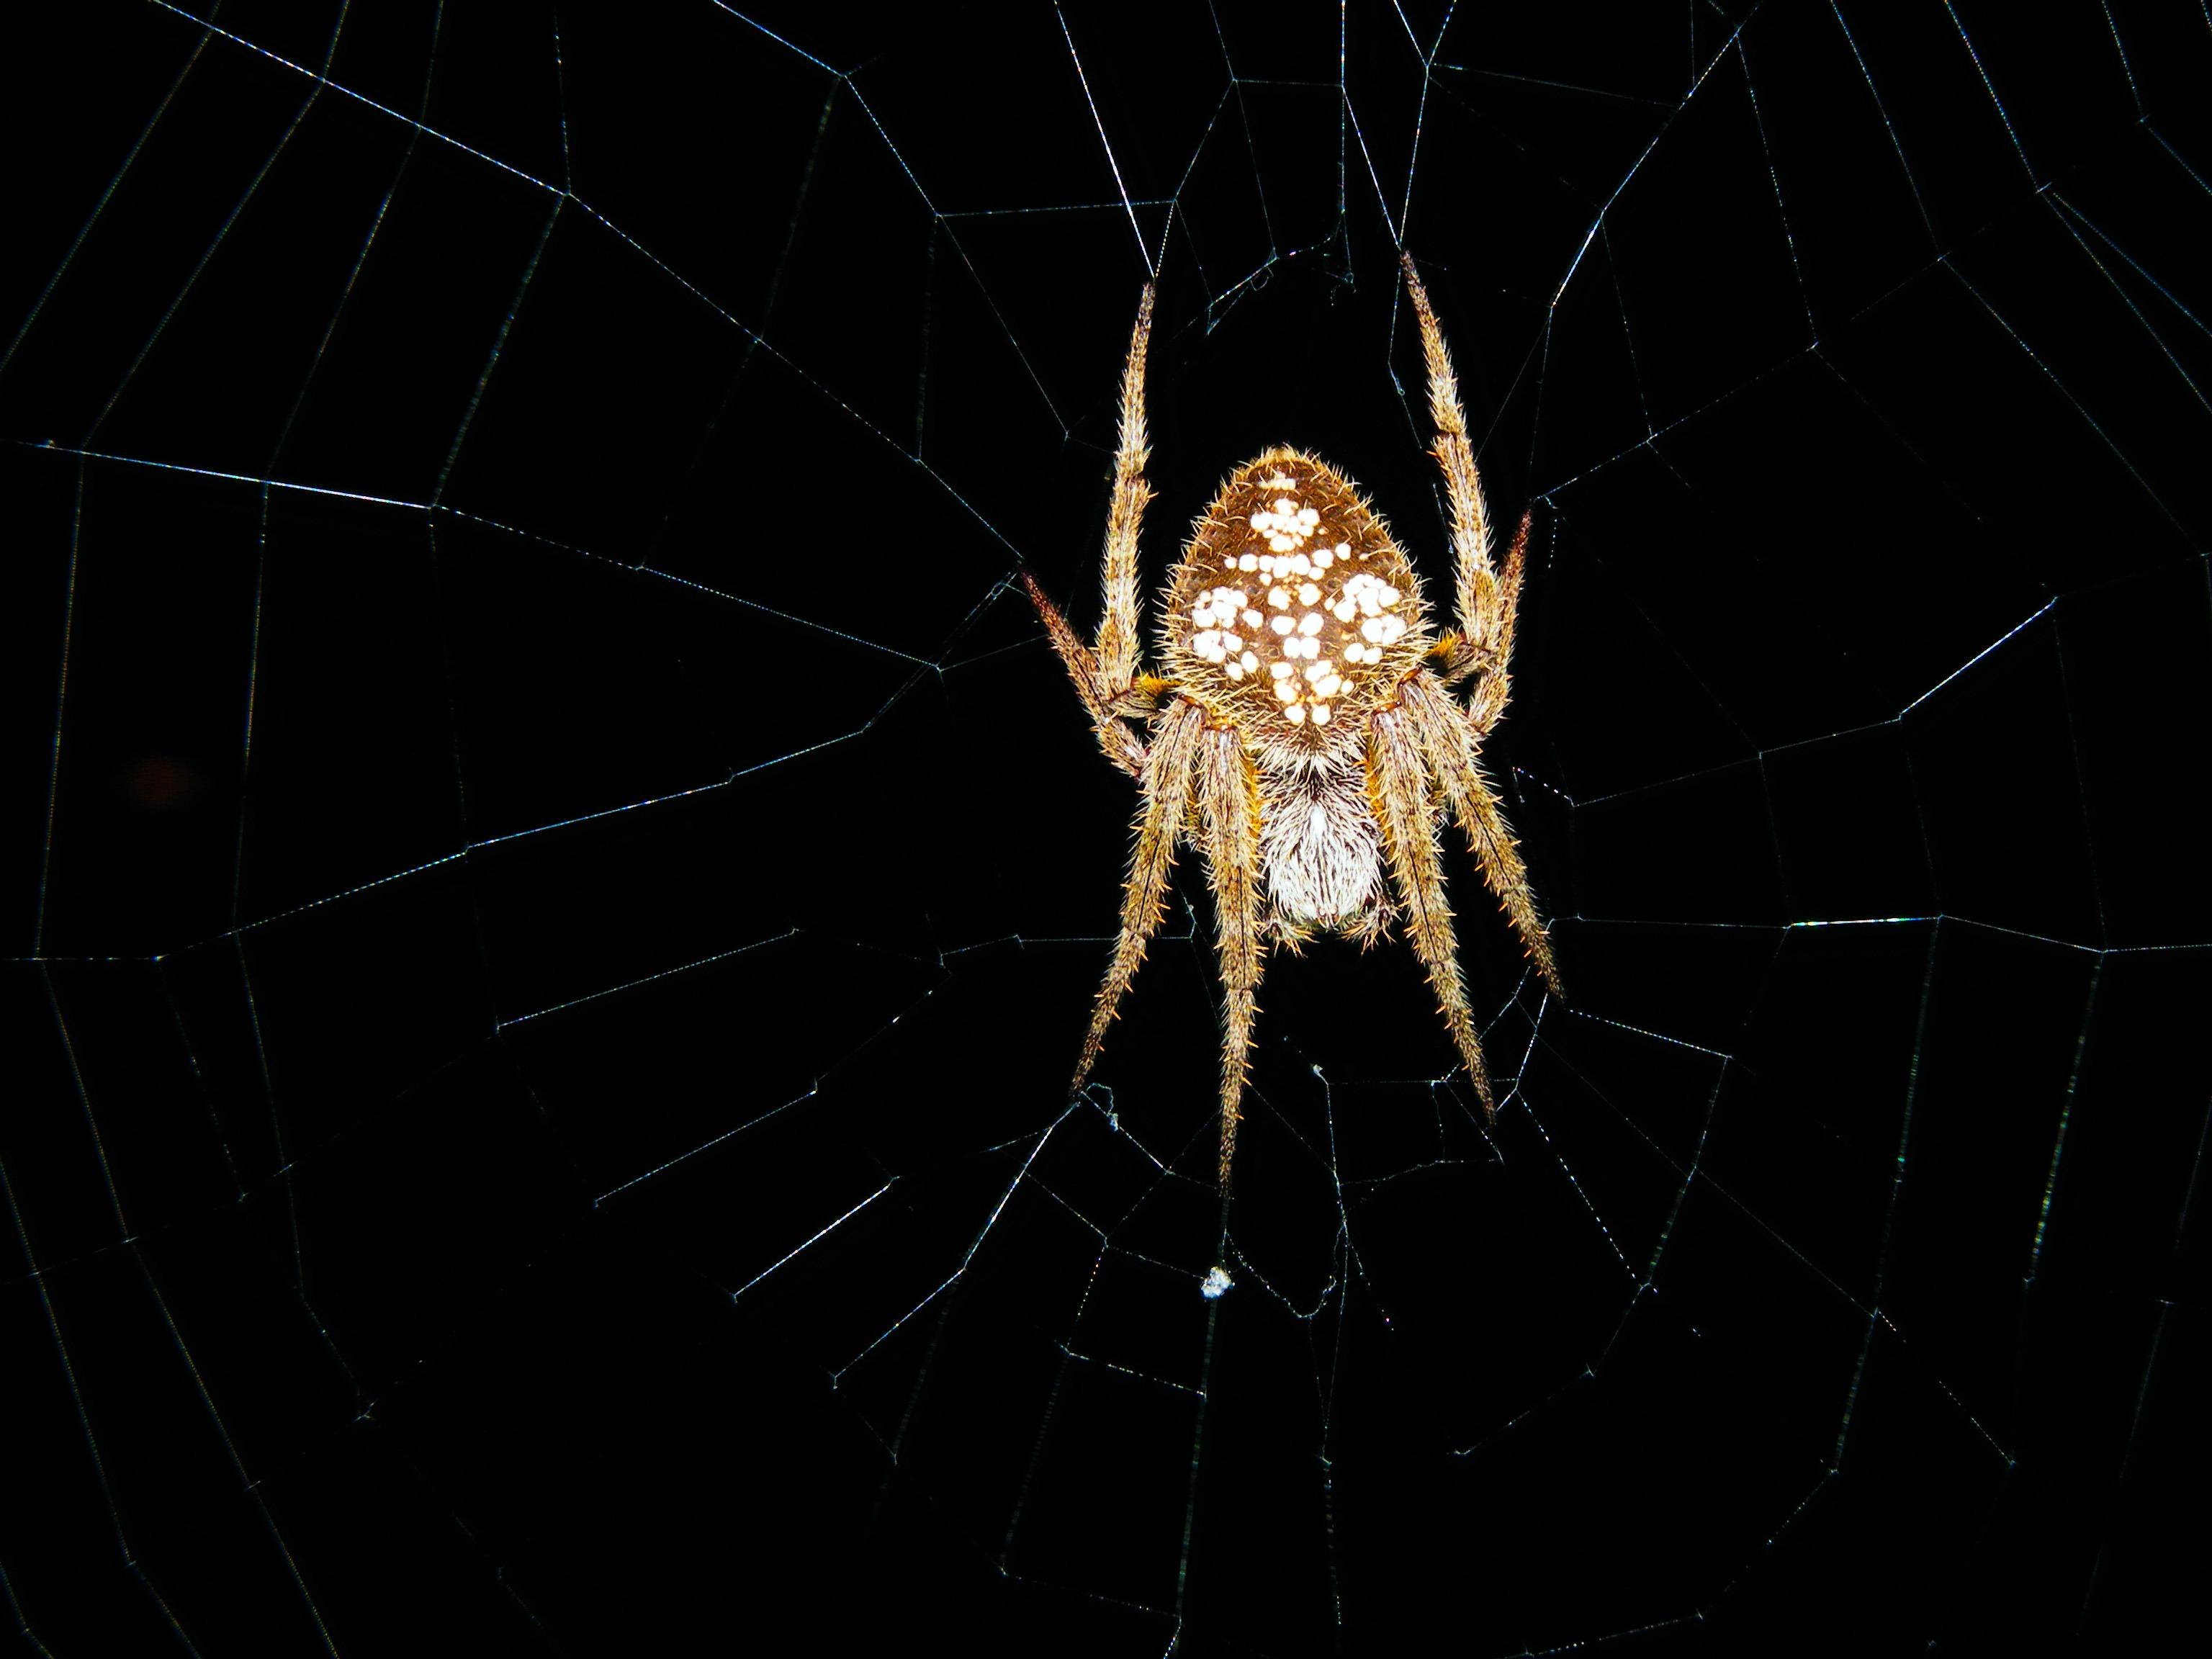 spooky dark insect halloween brown black material invertebrate spider web scary fear symmetry arachnid florida phobia macro photography - Phobia Halloween